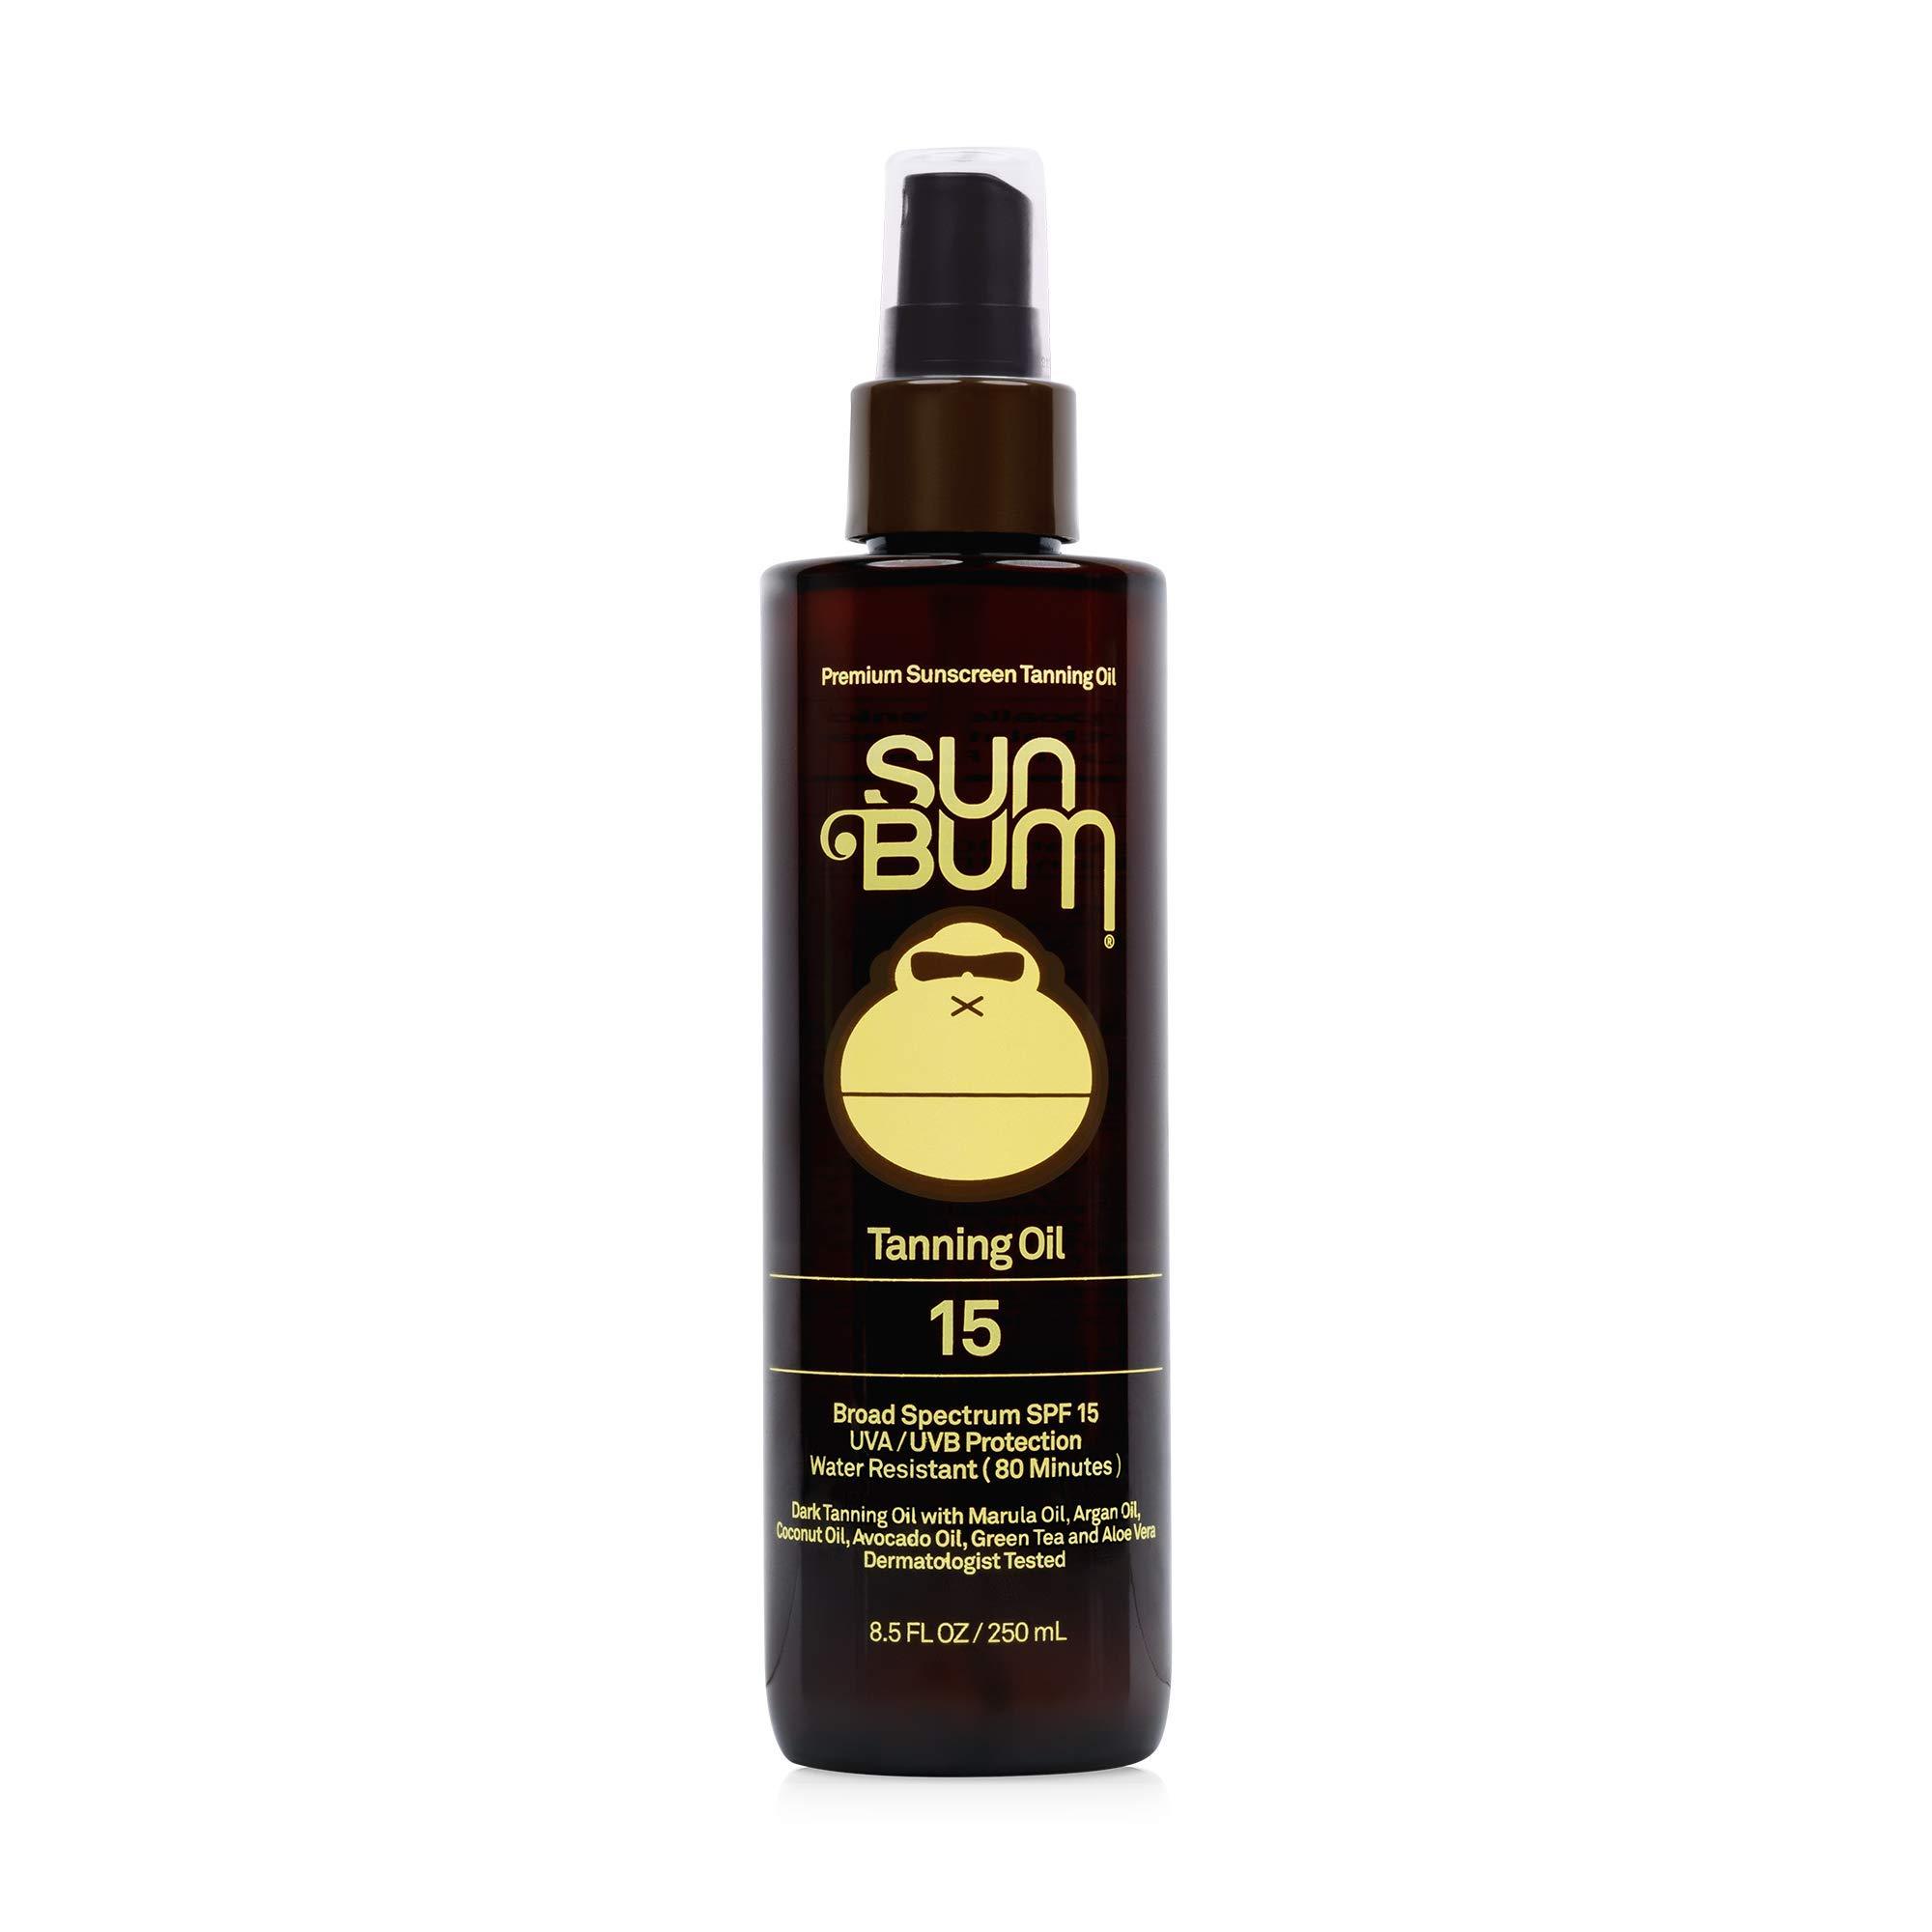 Sun Bum SPF 15 Moisturizing Tanning Oil   Broad Spectrum UVA/UVB Protection   Coconut Oil, Aloe Vera, Hypoallergenic, Paraben Free, Gluten Free, Vegan   8.5 oz Bottle, 1 Count